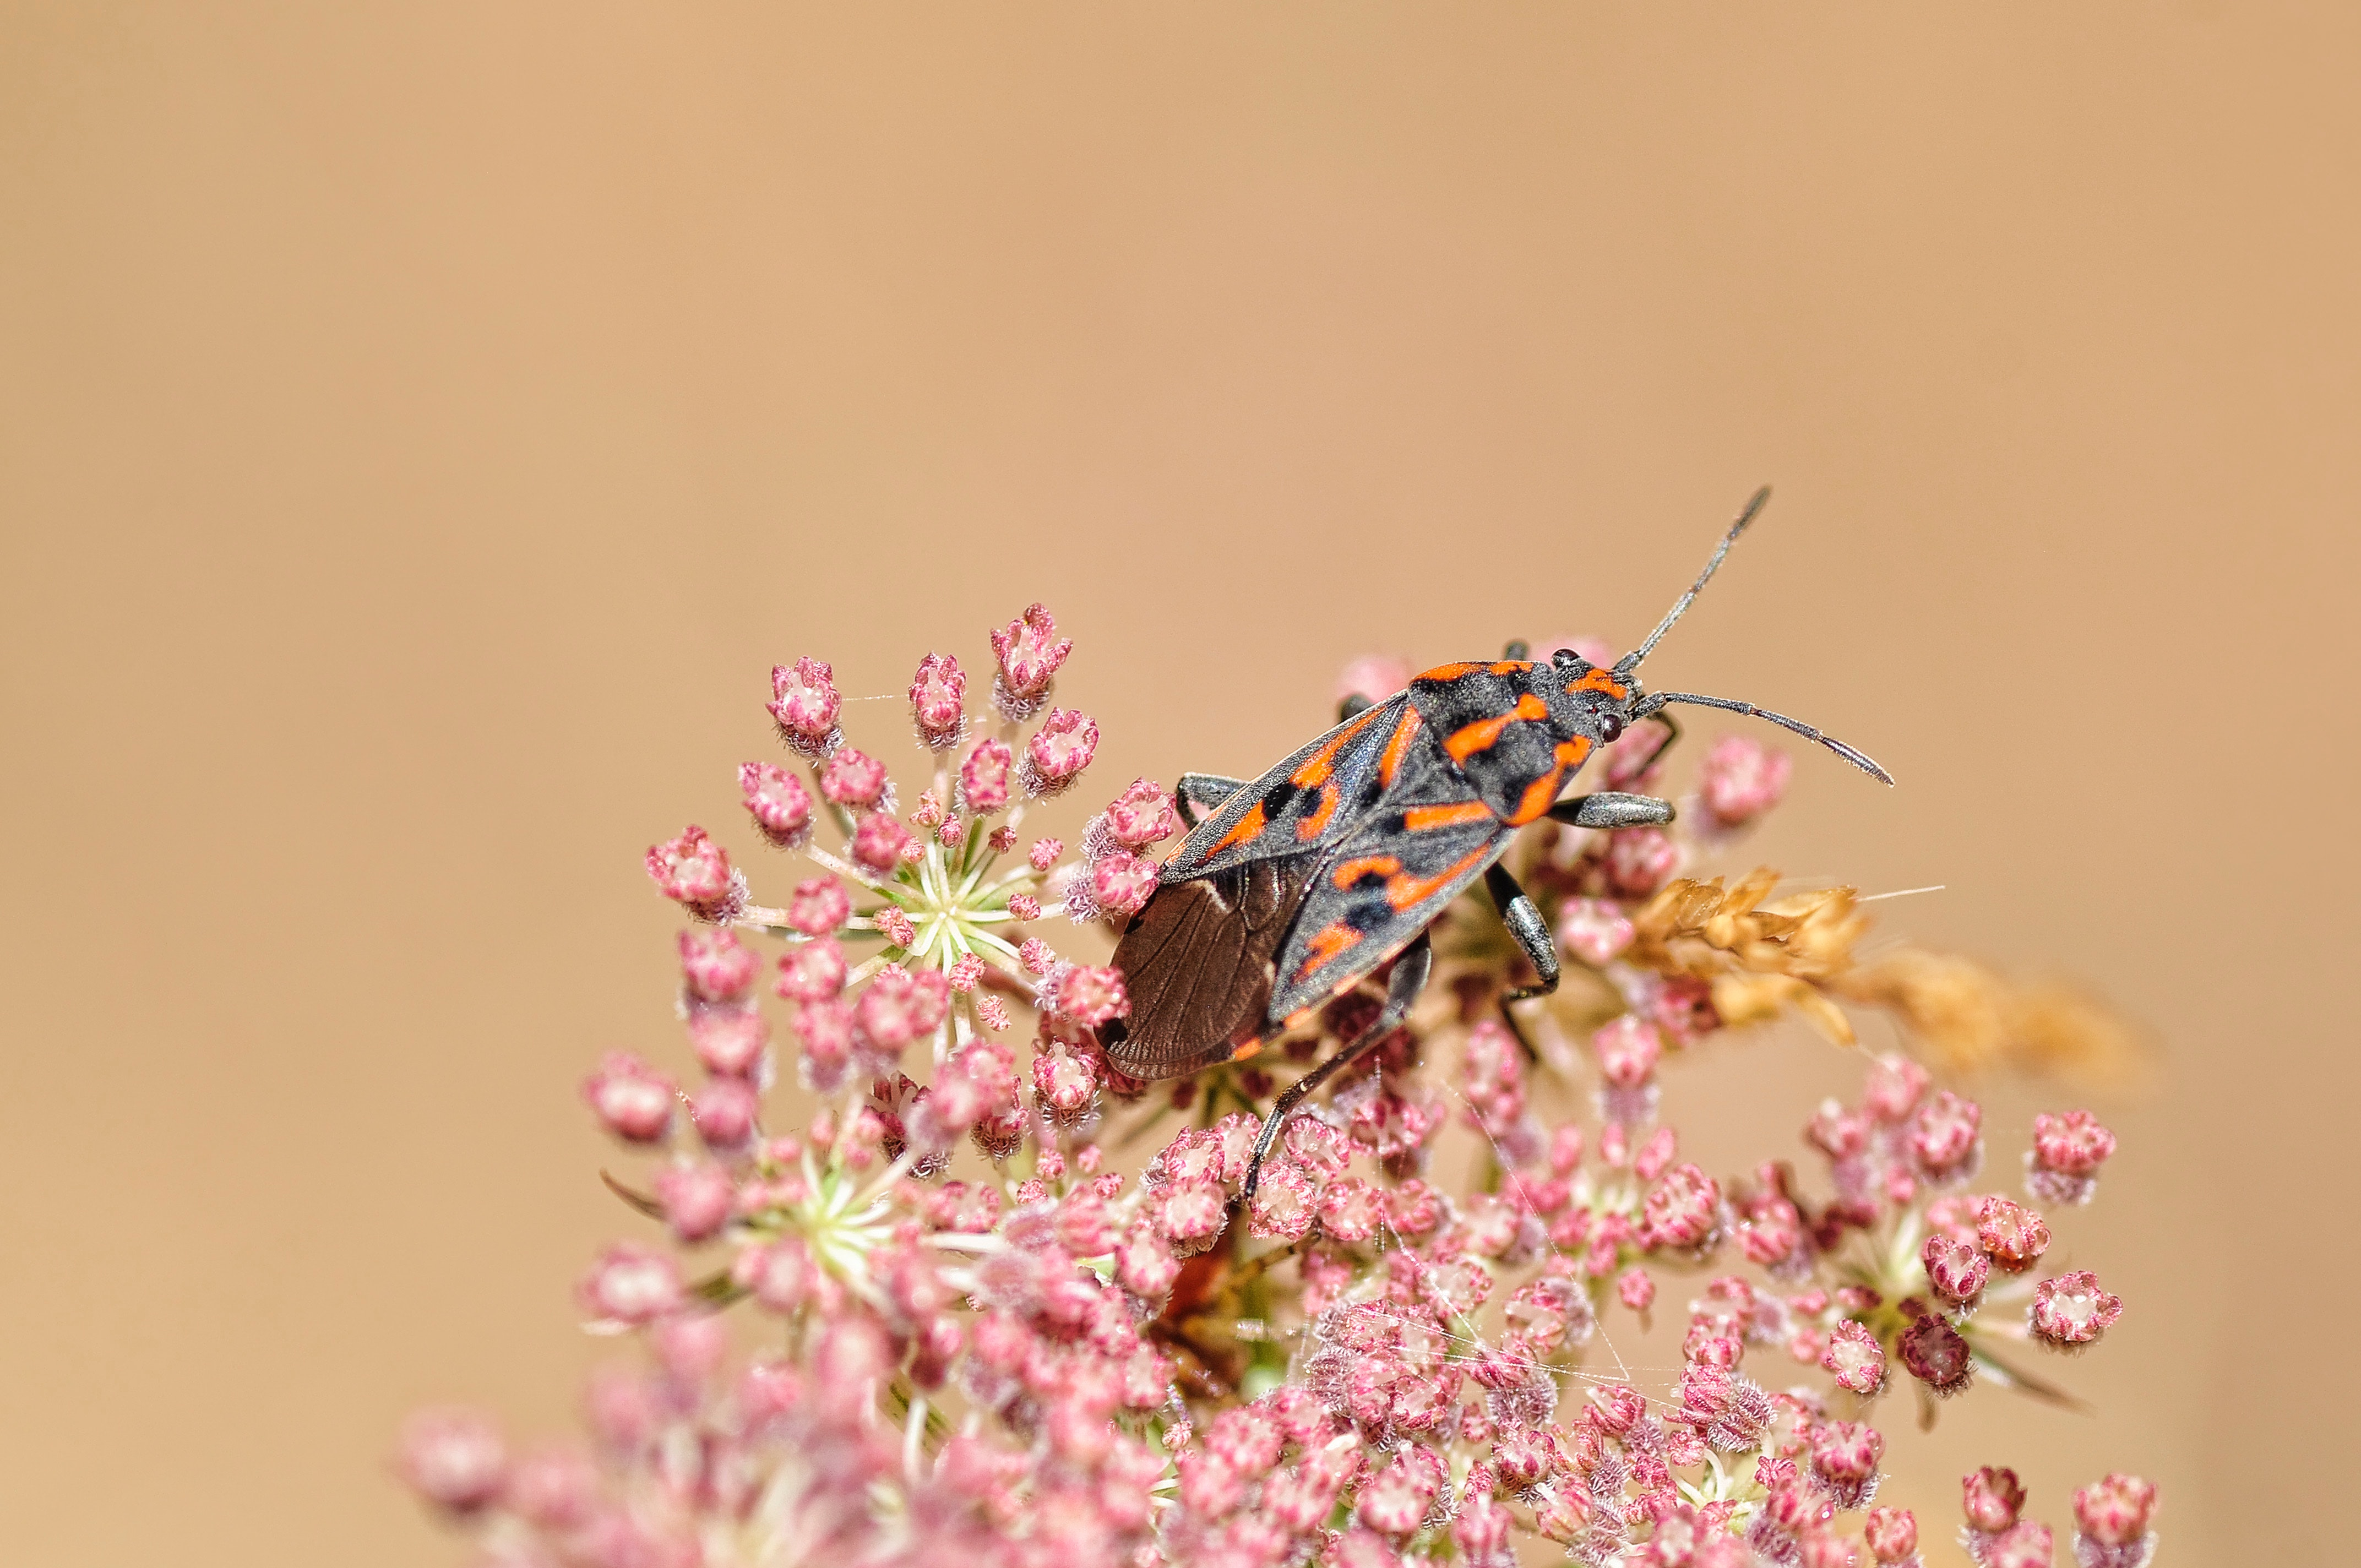 Black Gray and Orange Reduviidae, Beetle, Bloom, Blossom, Bug, HQ Photo